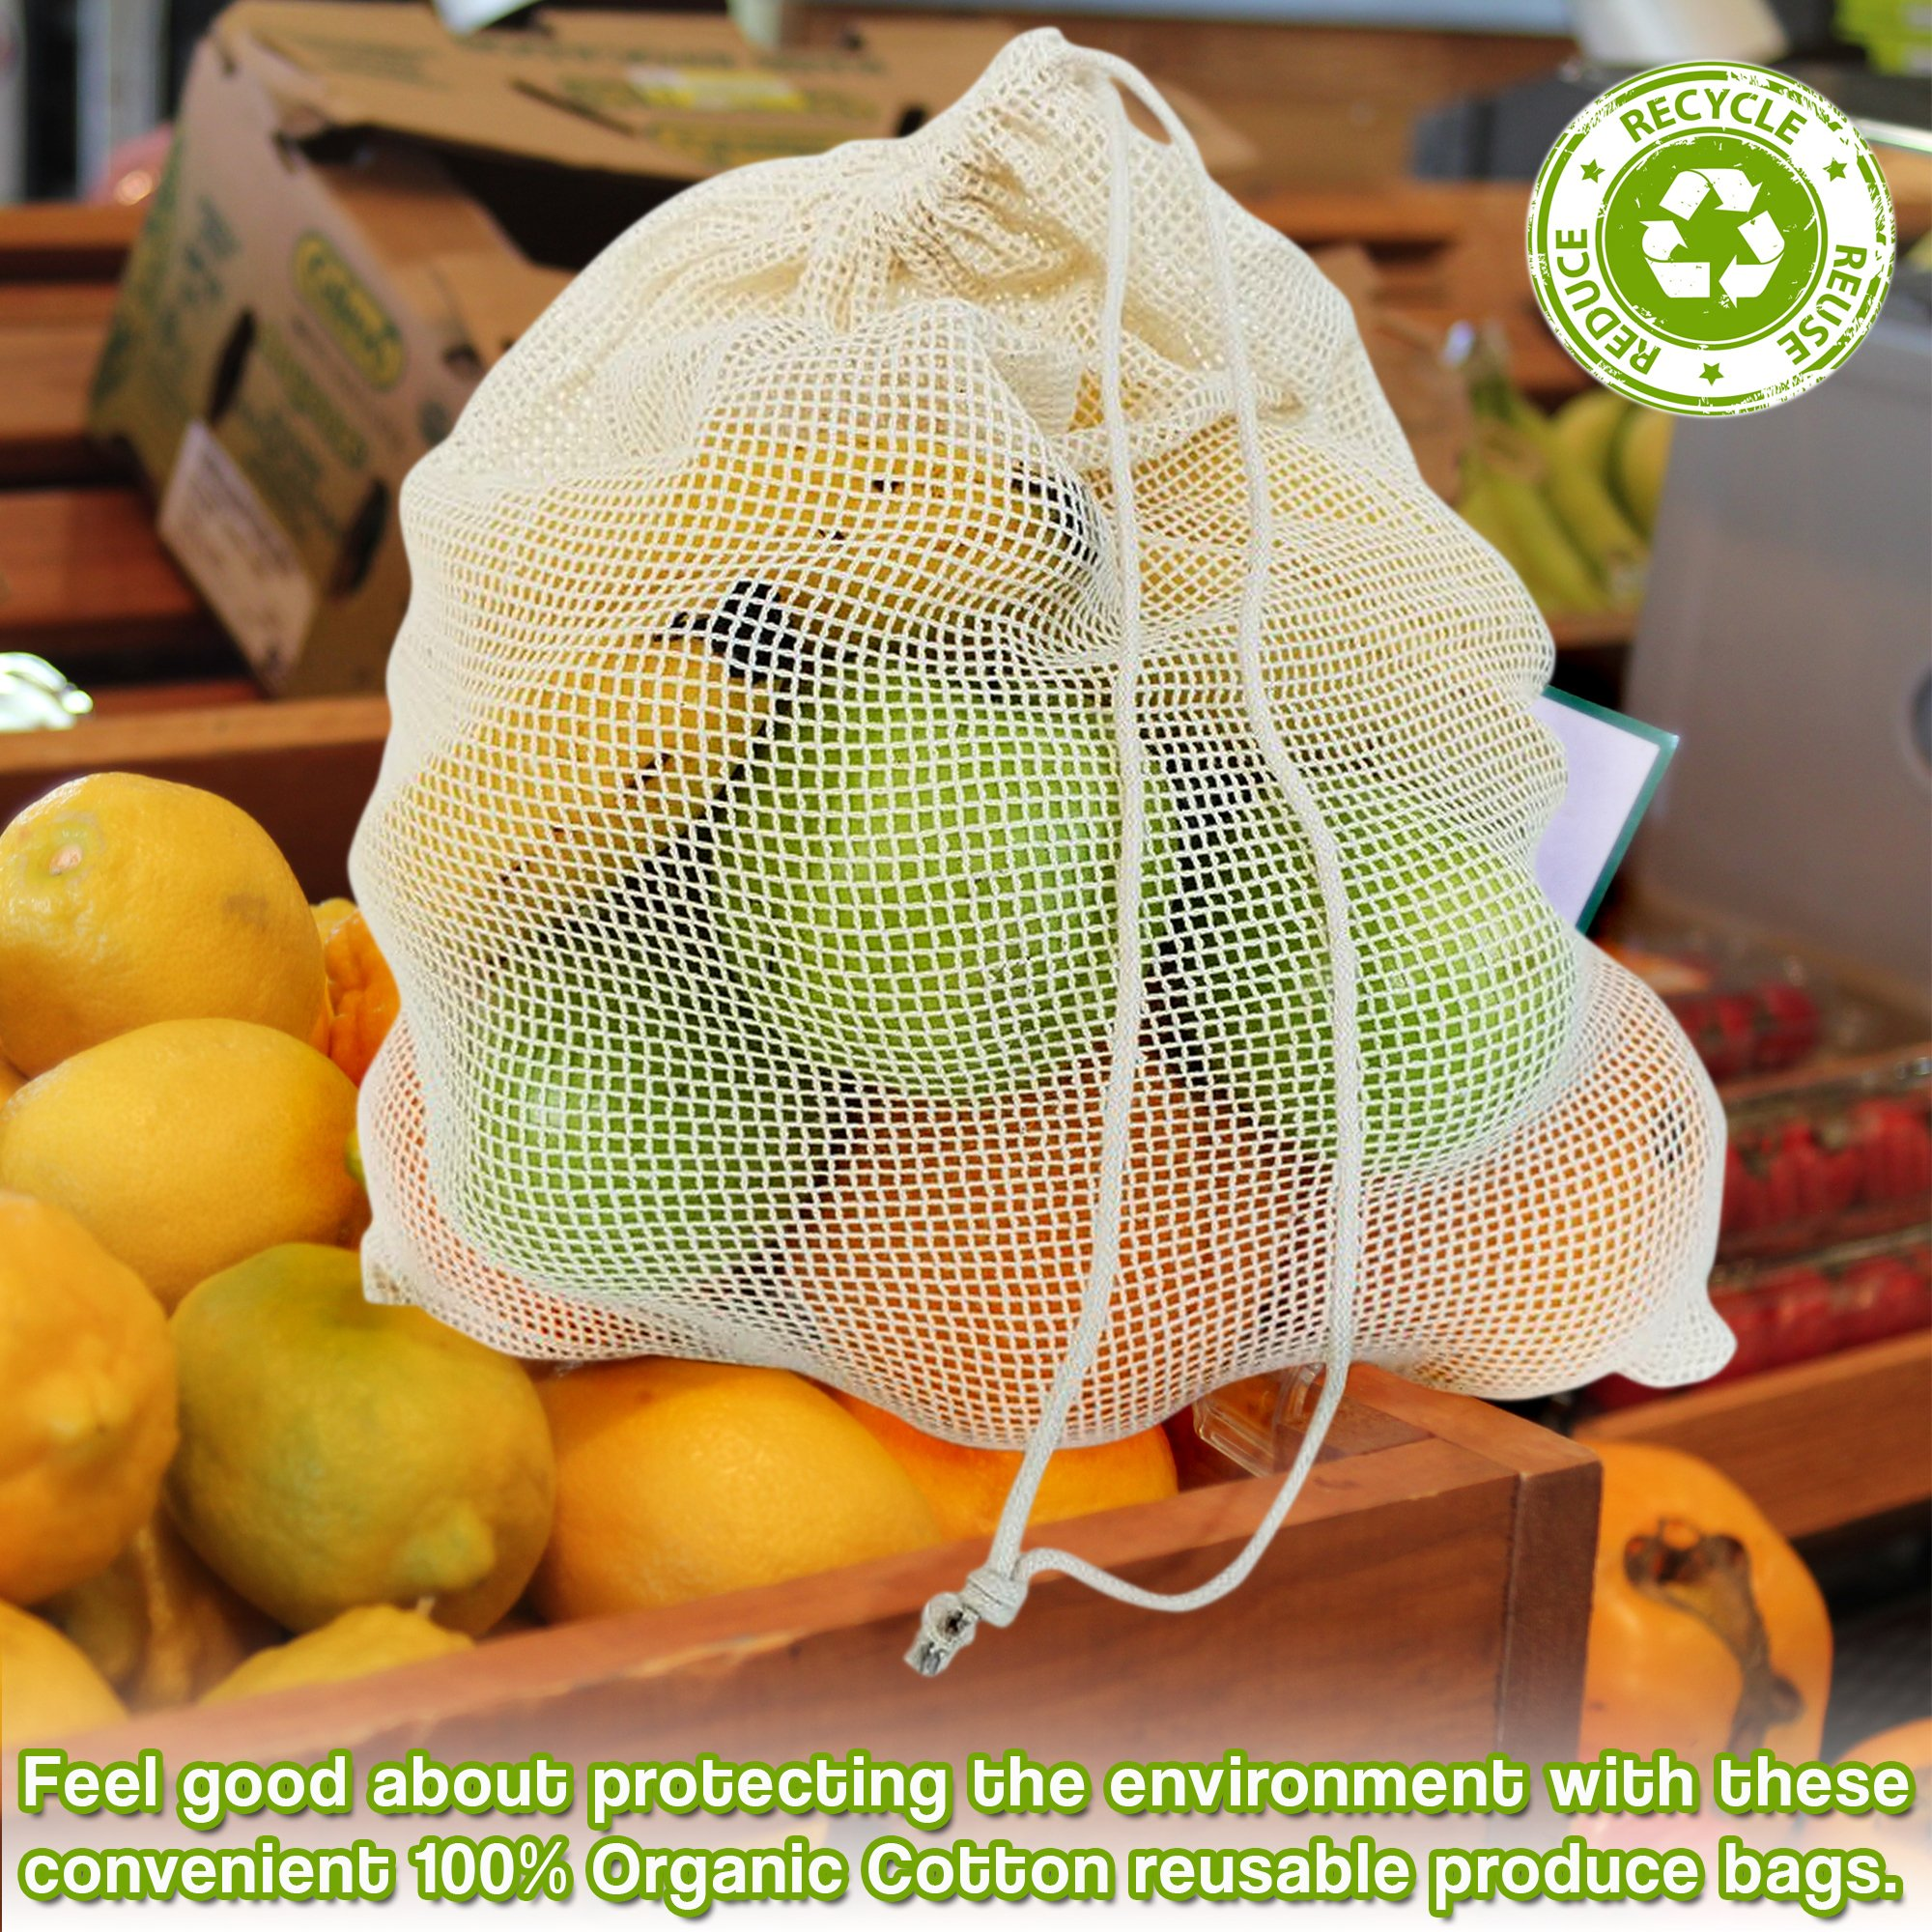 6 Bolsas de Vegetales Reutilizables (S M L) - Ecológico y ...